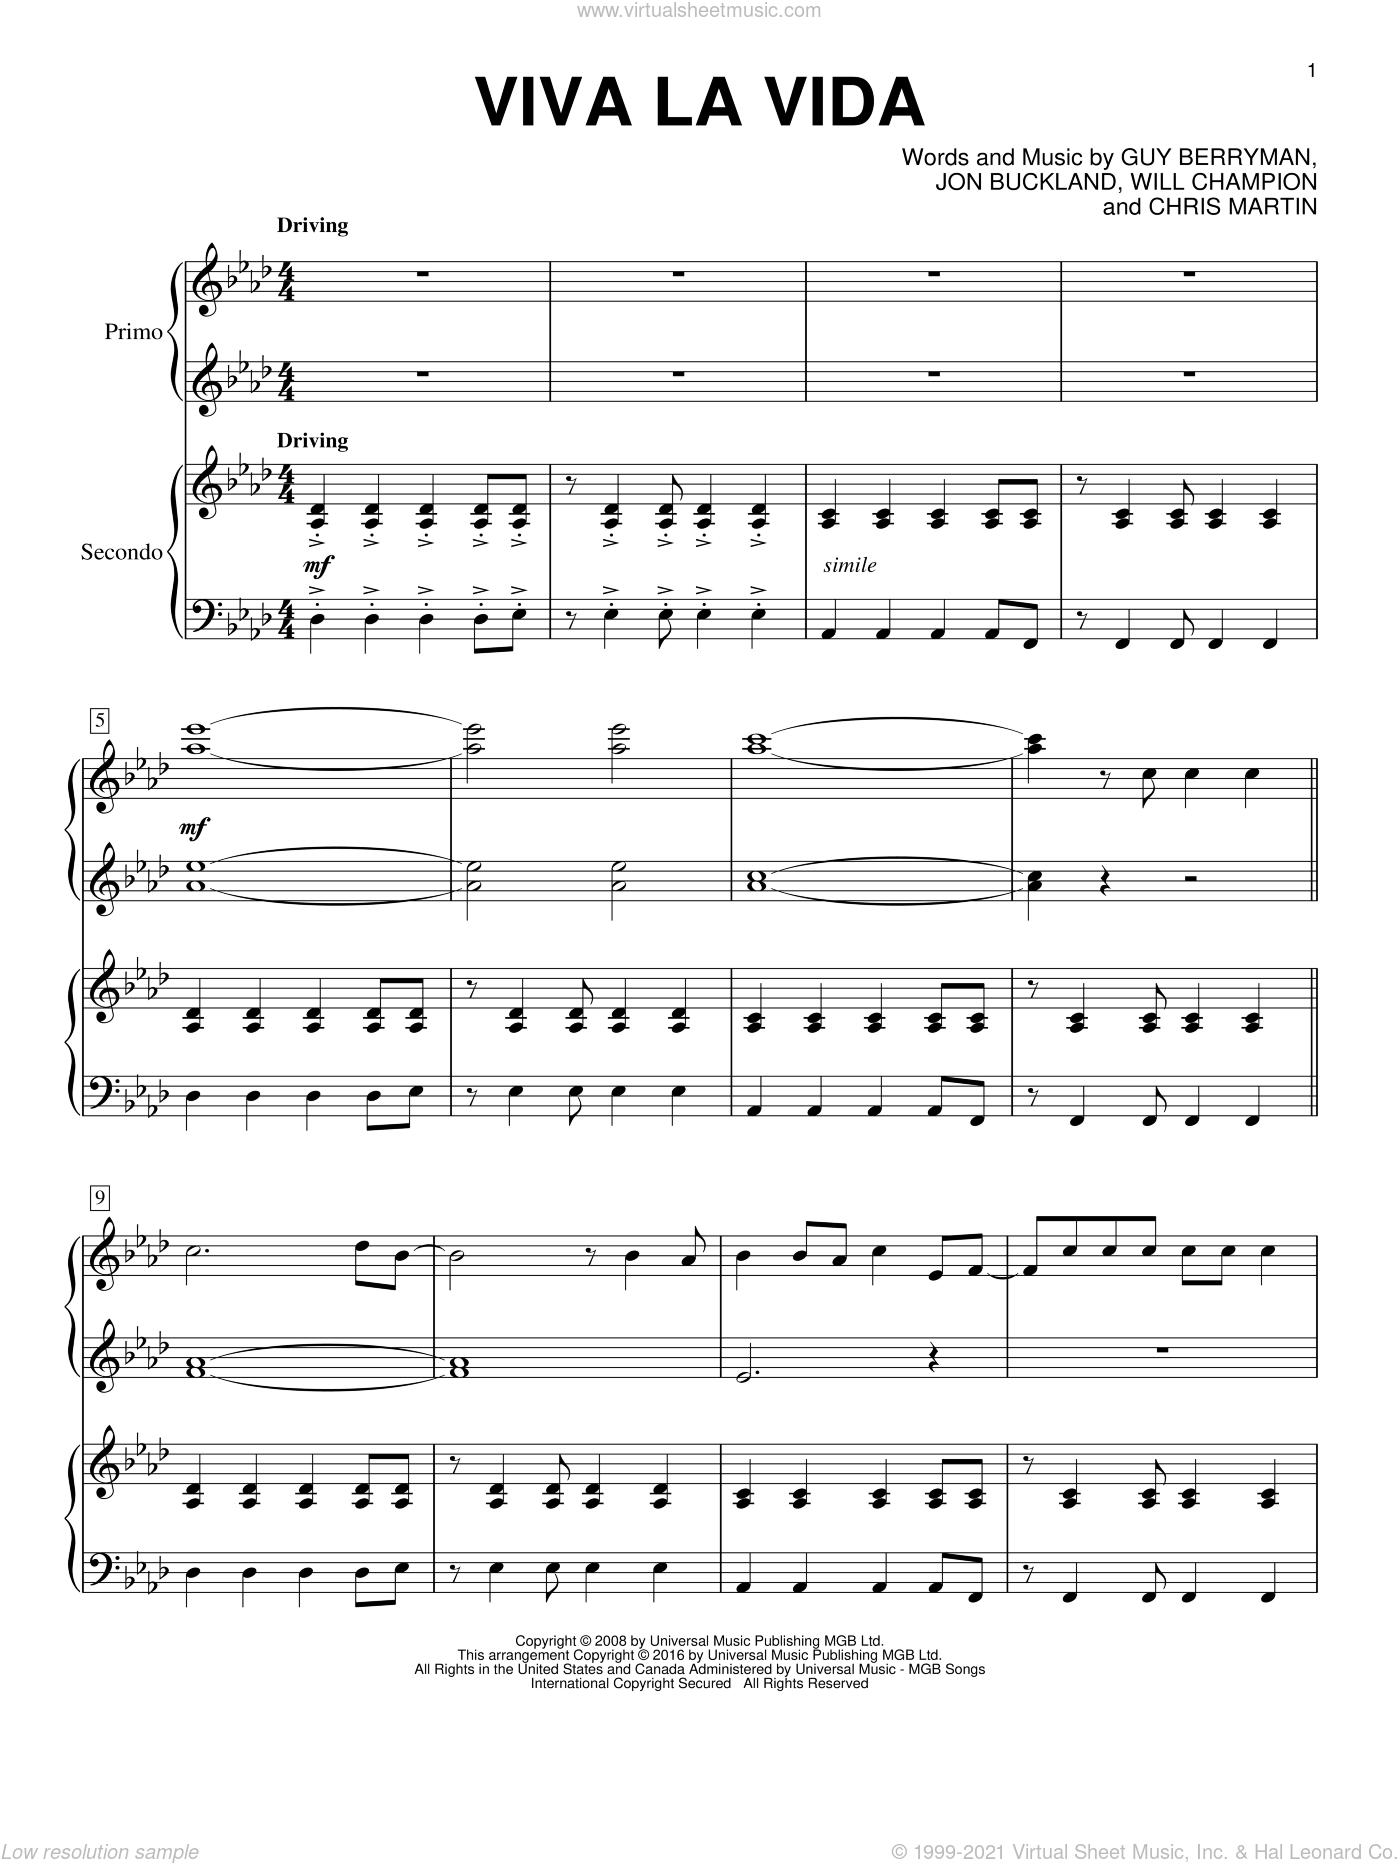 Viva La Vida sheet music for piano four hands by Coldplay, Chris Martin, Guy Berryman, Jon Buckland and Will Champion, intermediate skill level